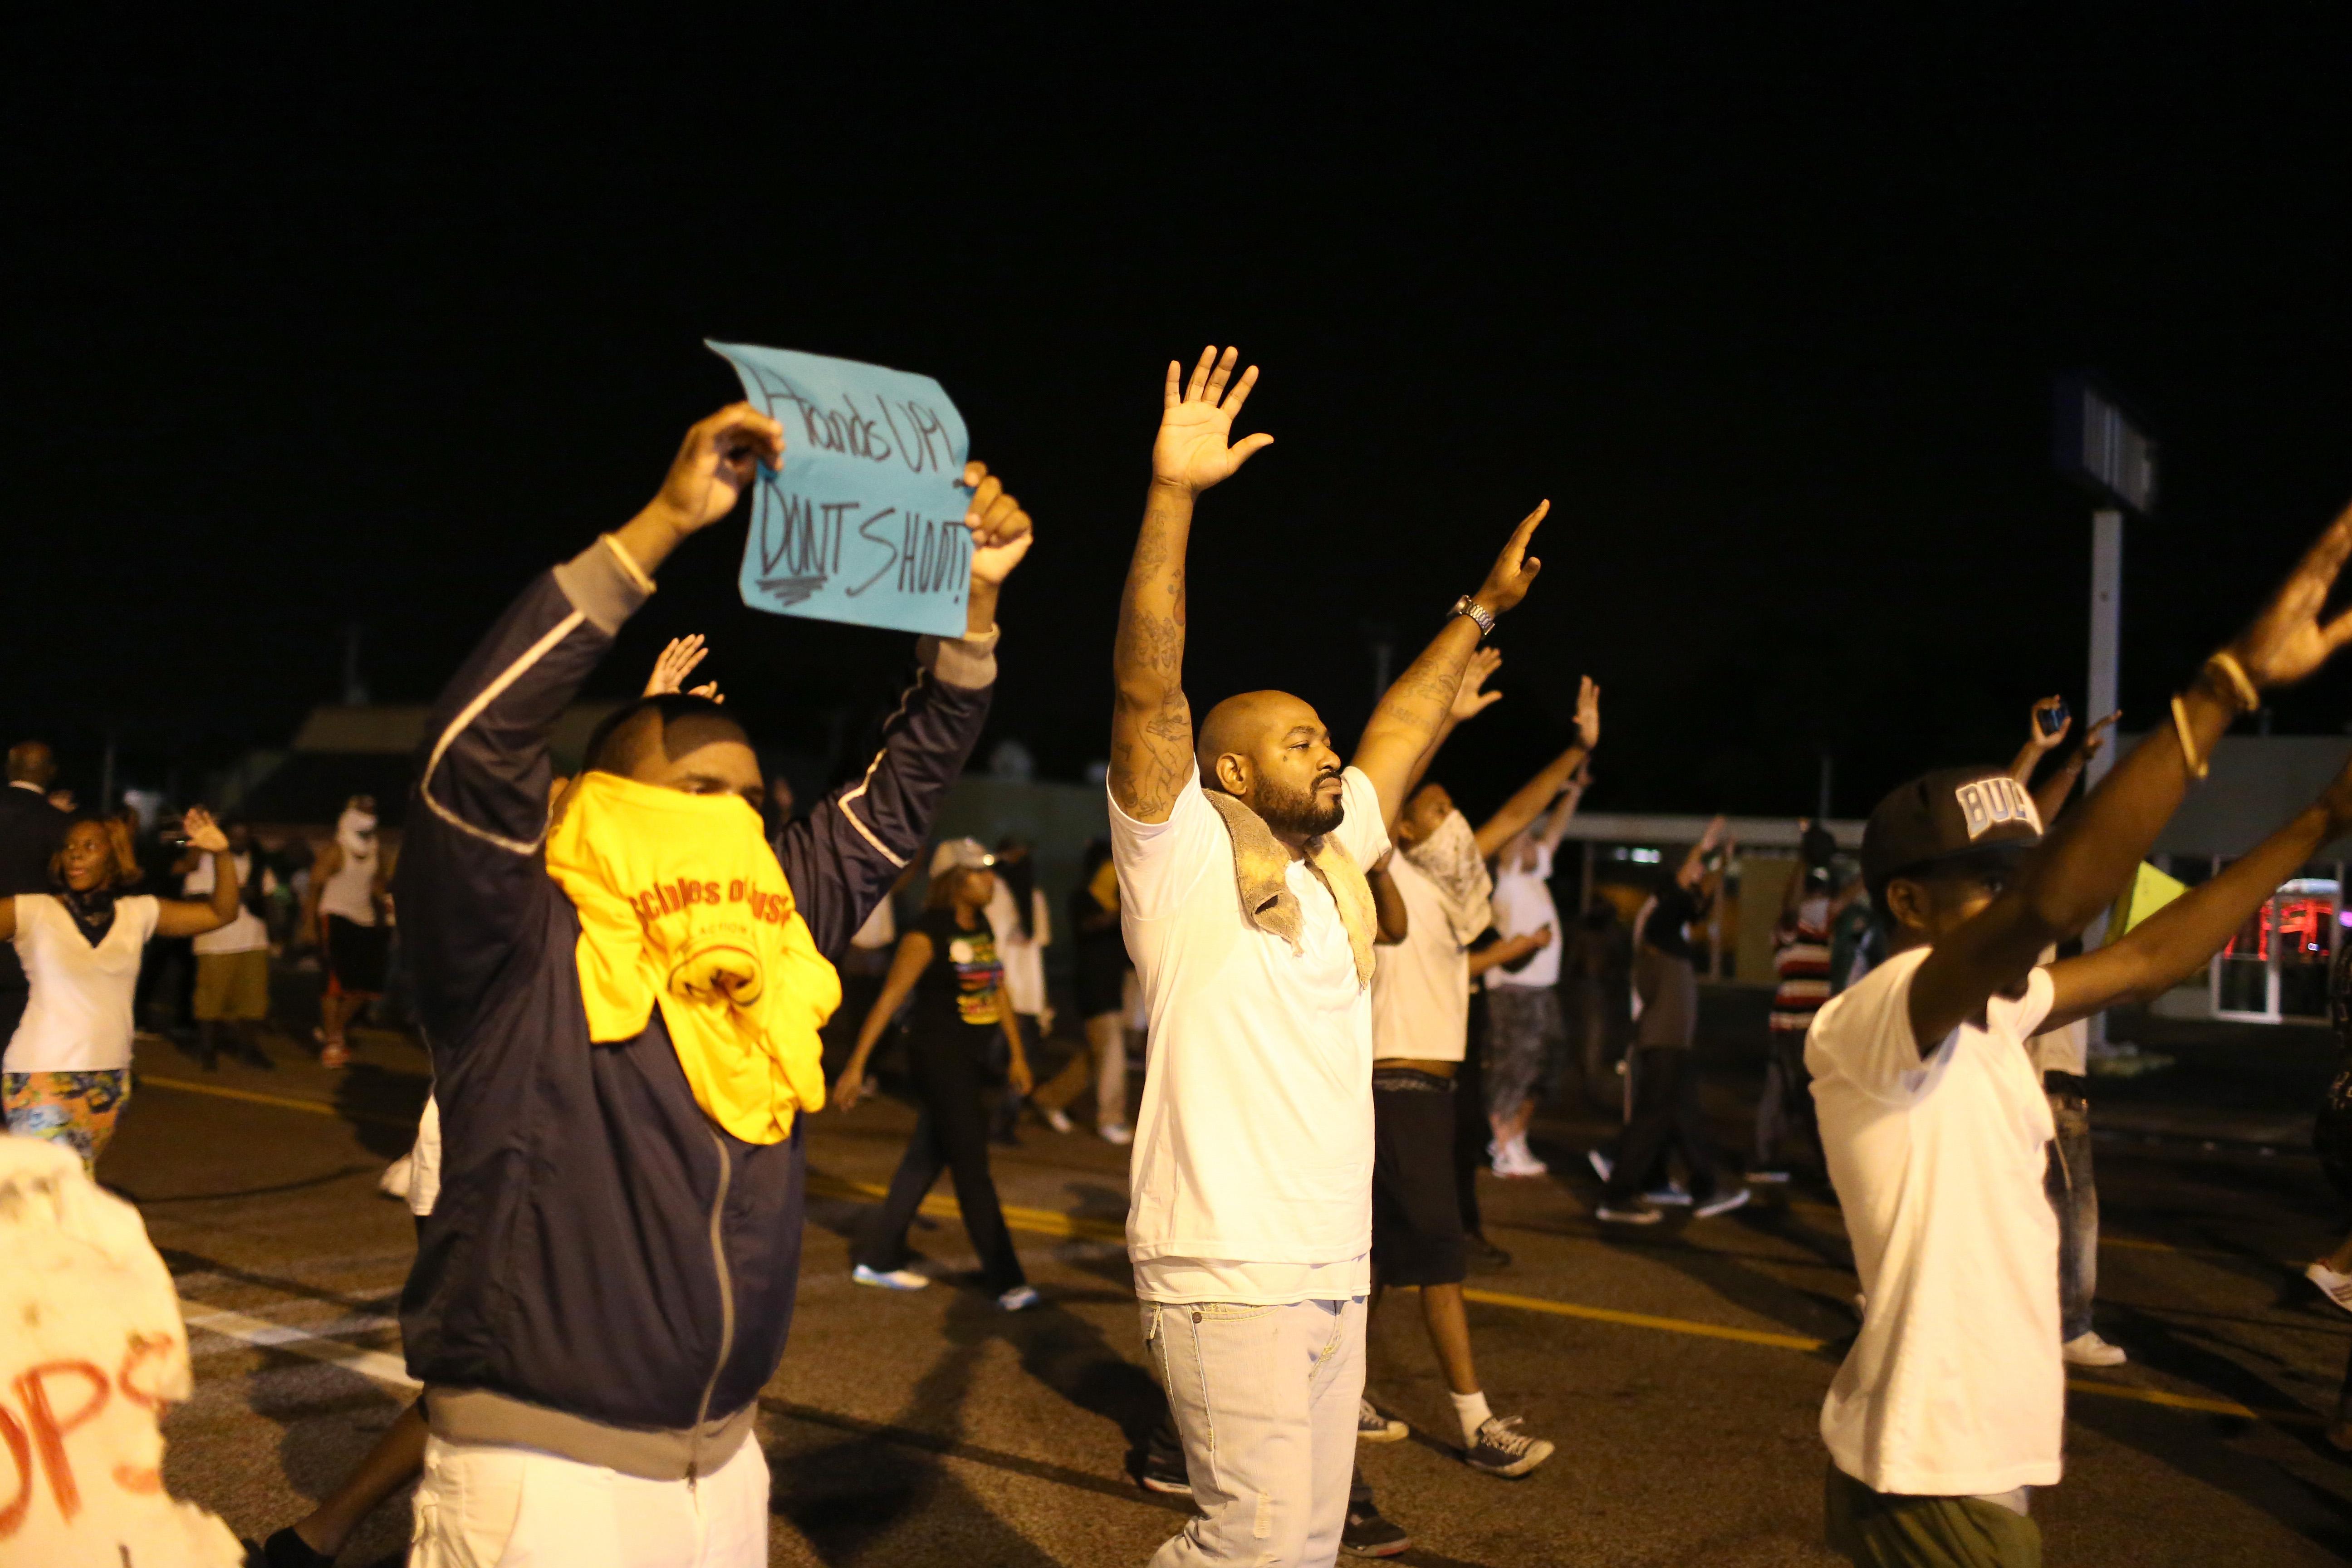 Ferguson protest hands up